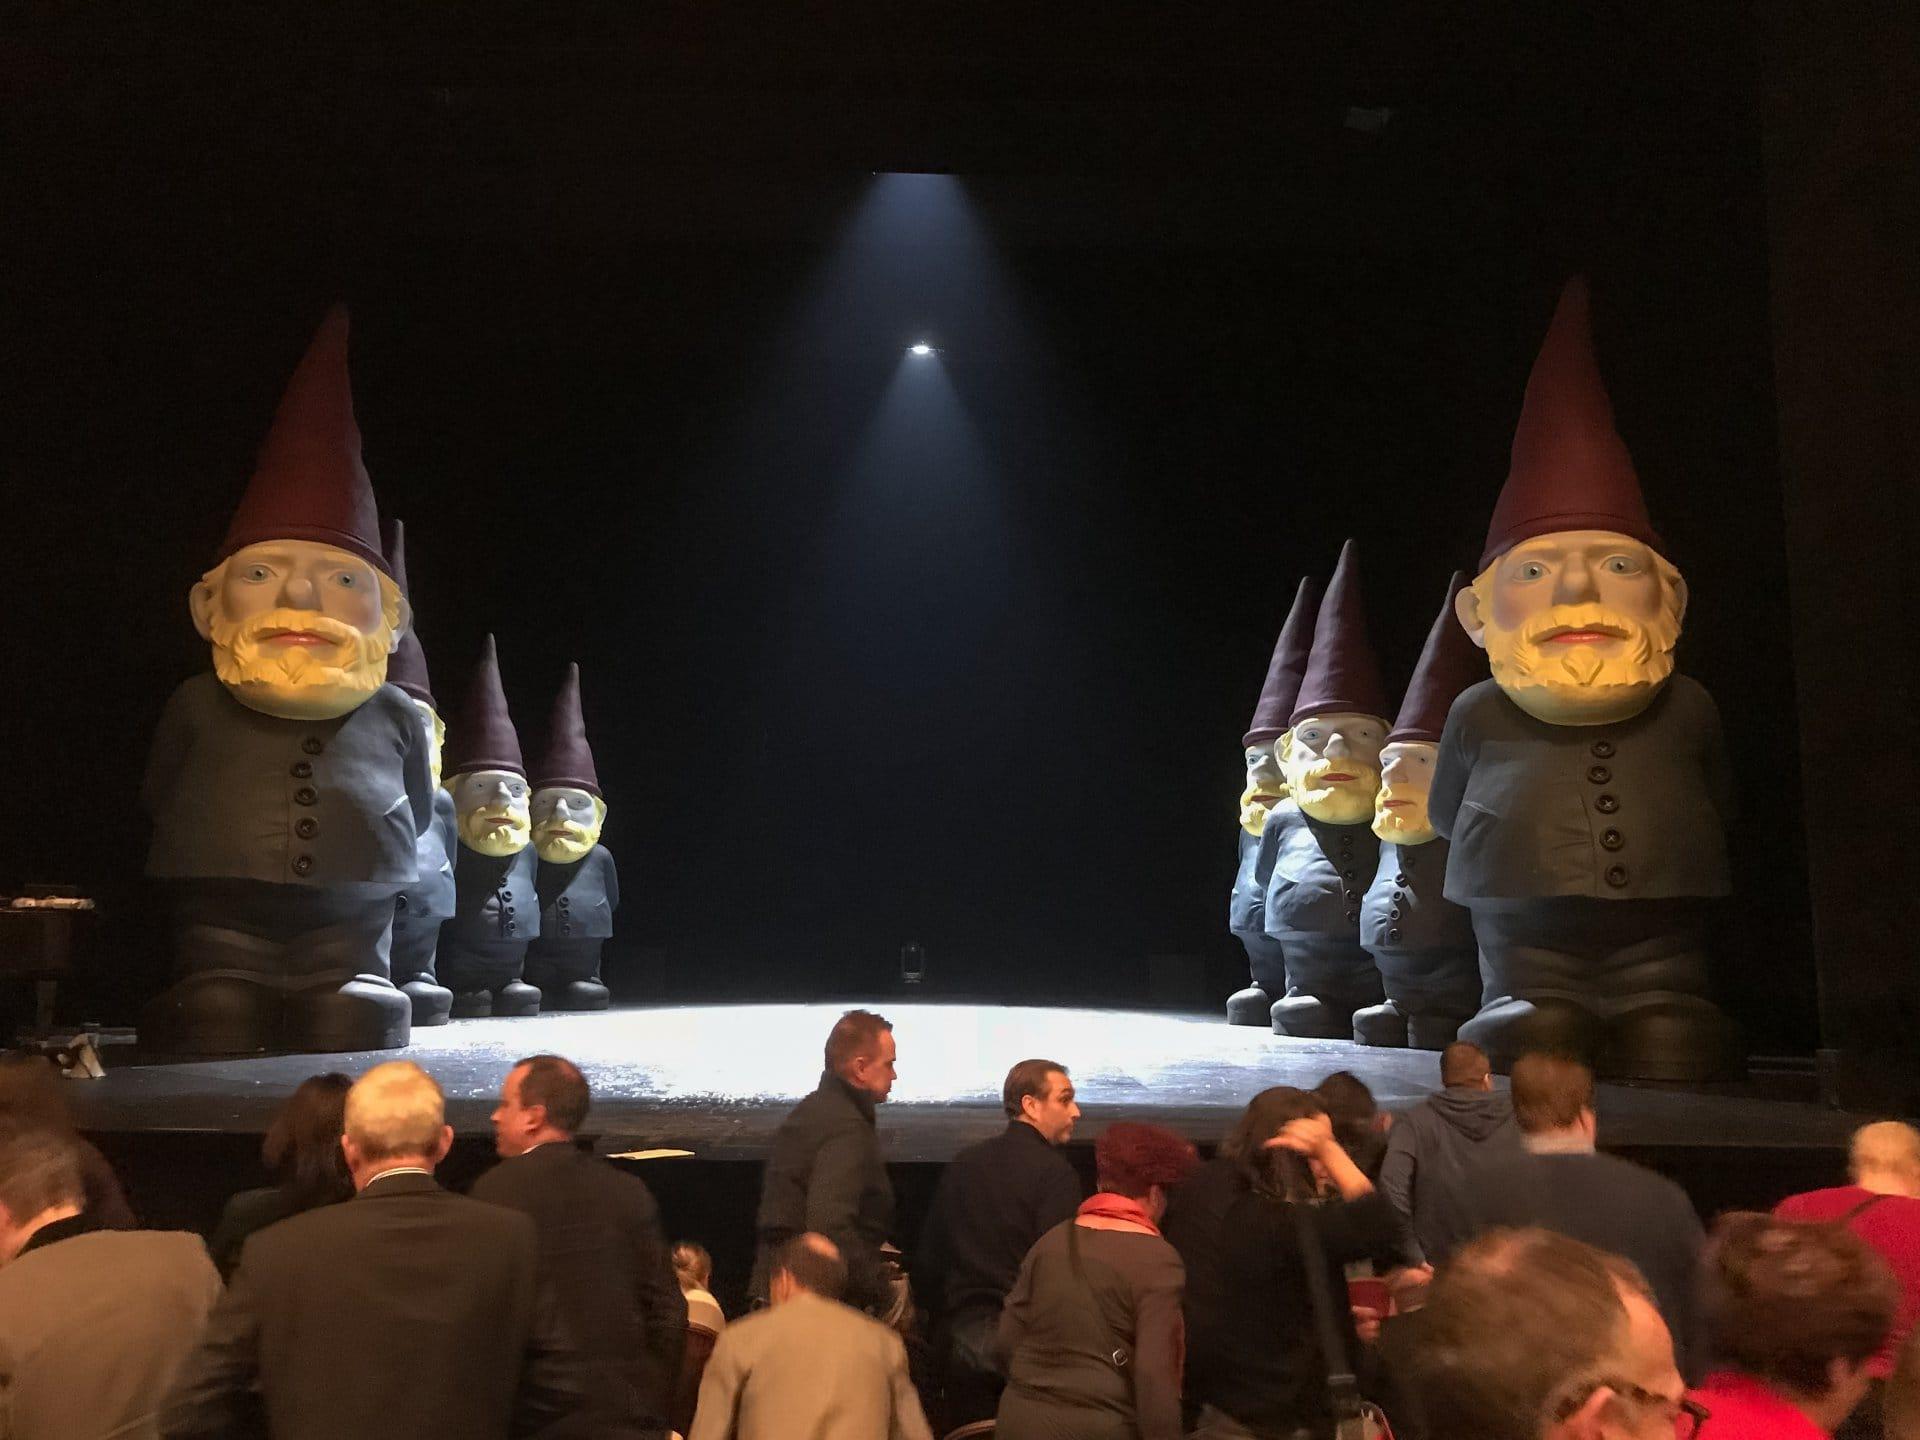 2017 12 02 burgtheater 3